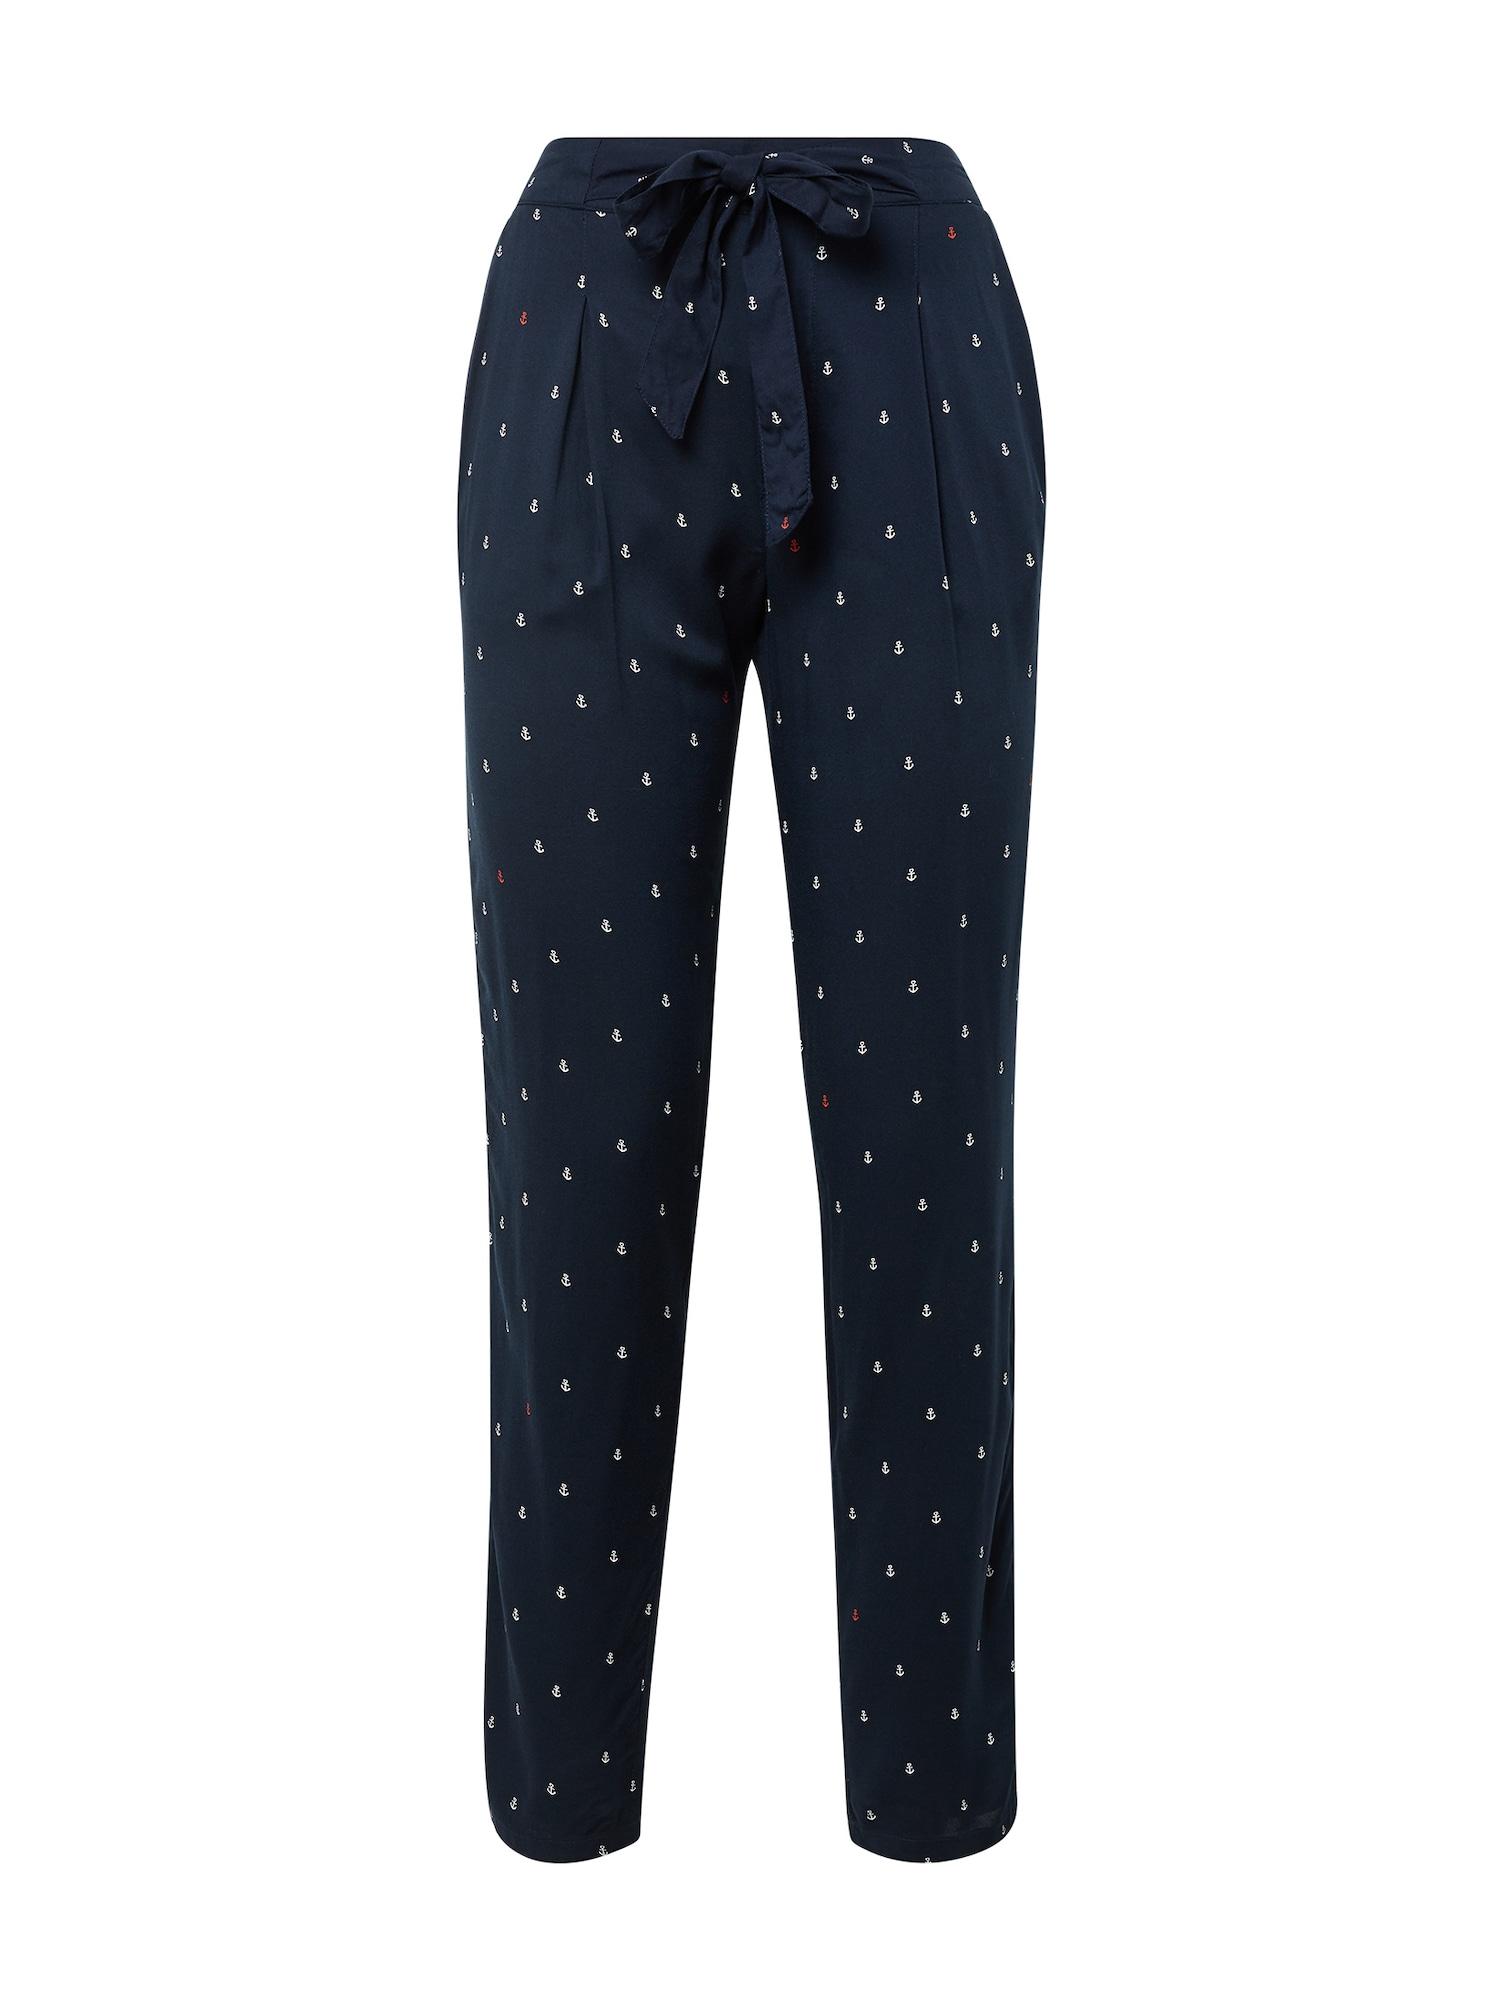 Kalhoty se sklady v pase tmavě modrá TOM TAILOR DENIM